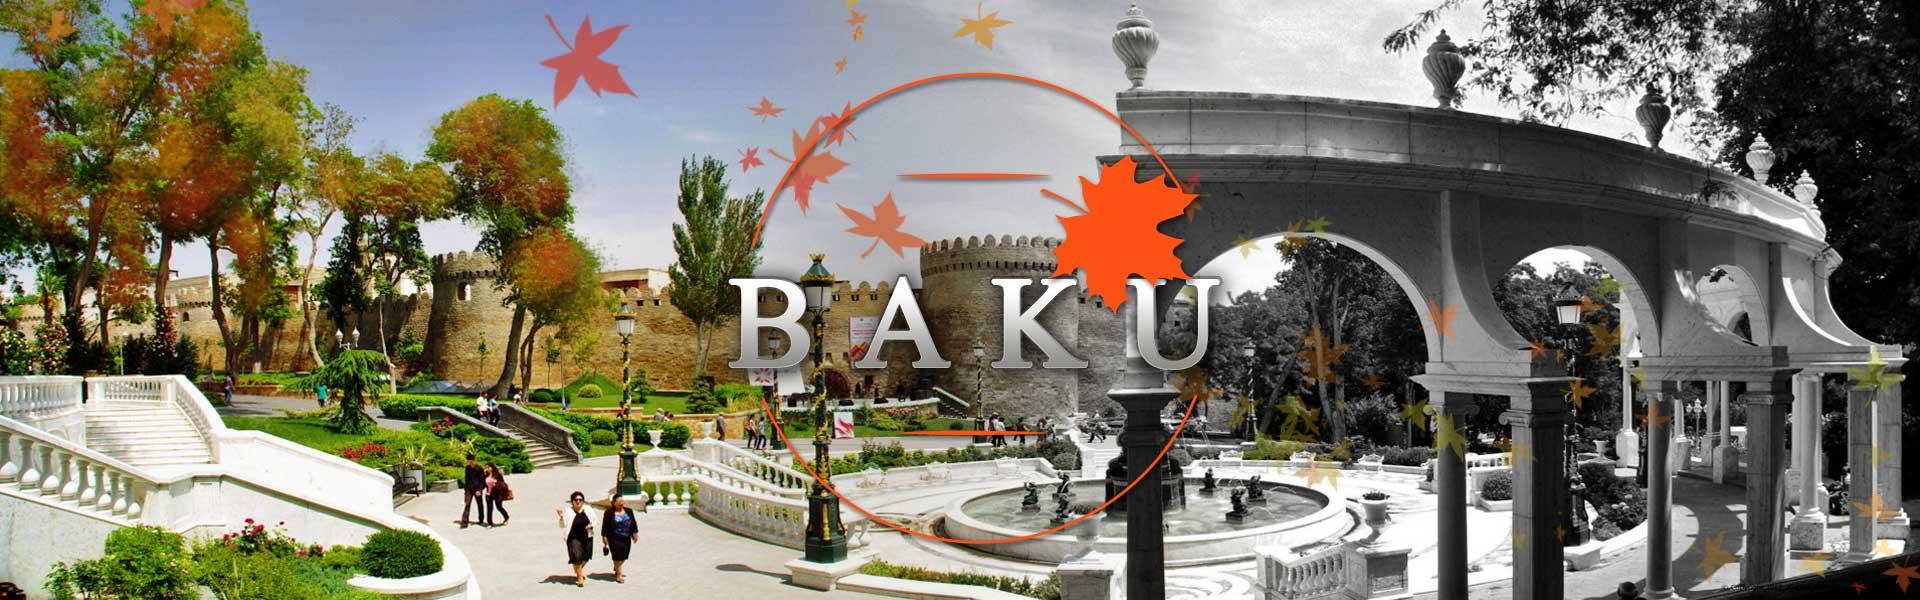 baku-autumn